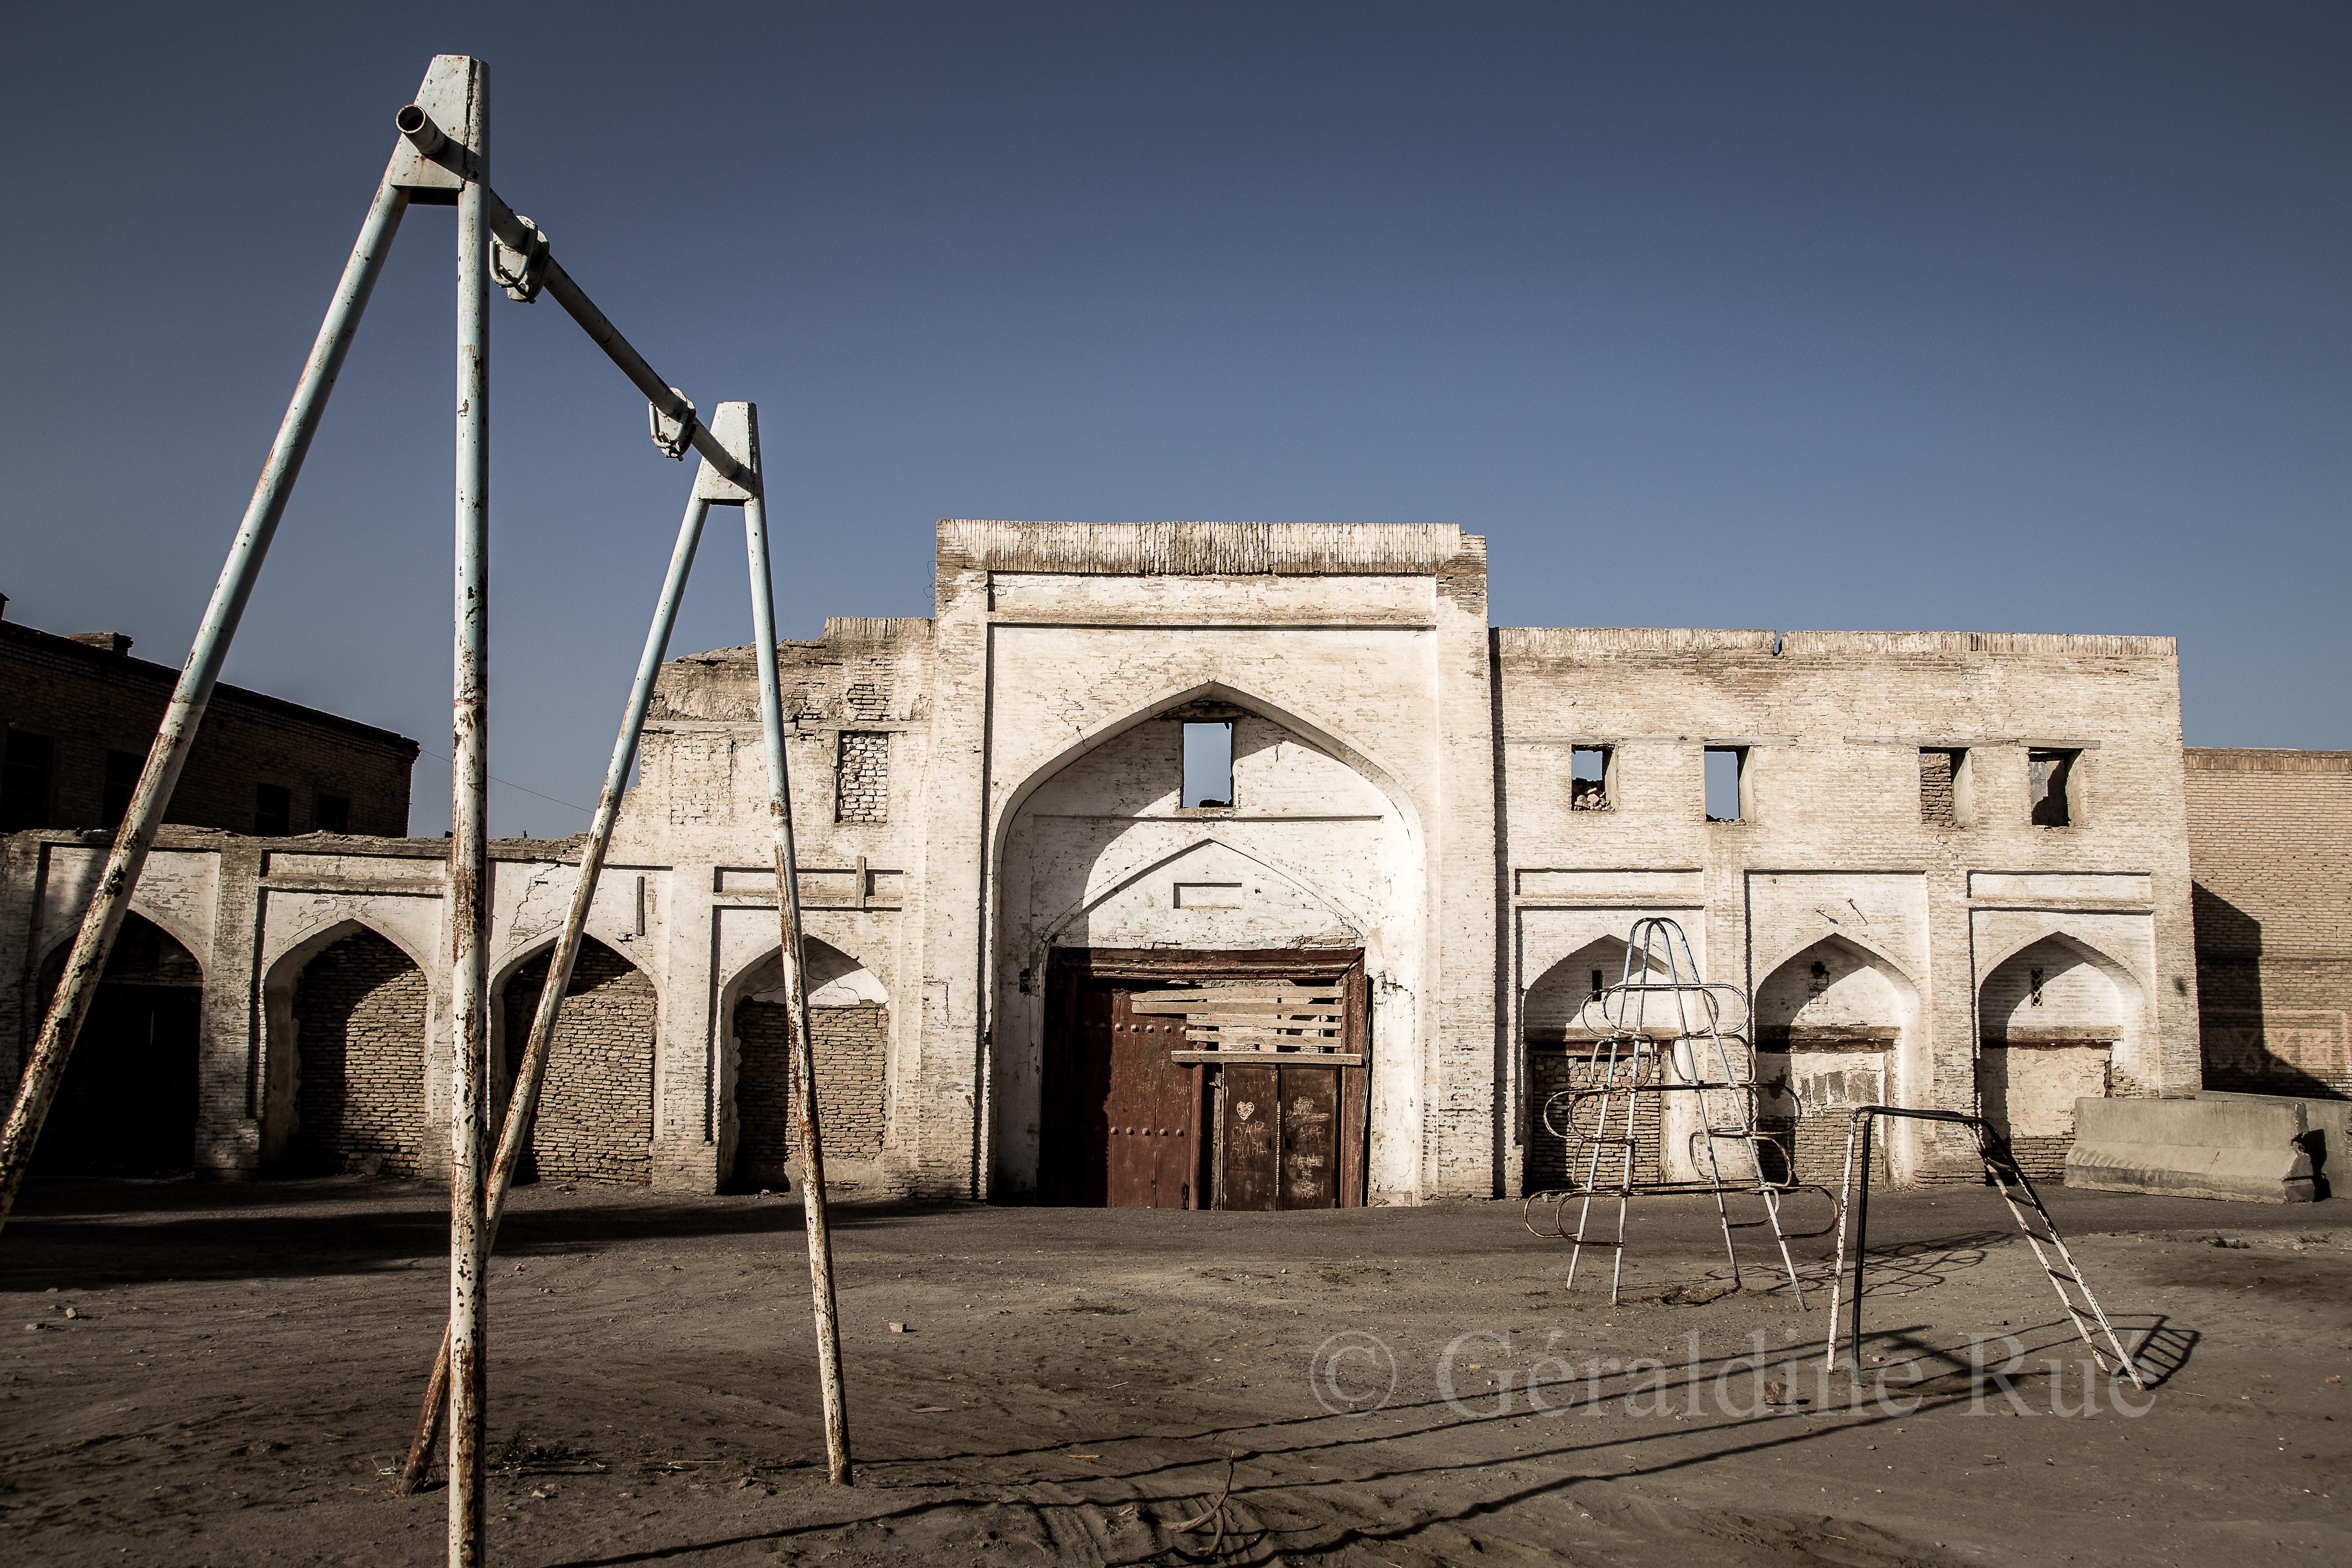 Ouzbekistan3800© Géraldine Rué